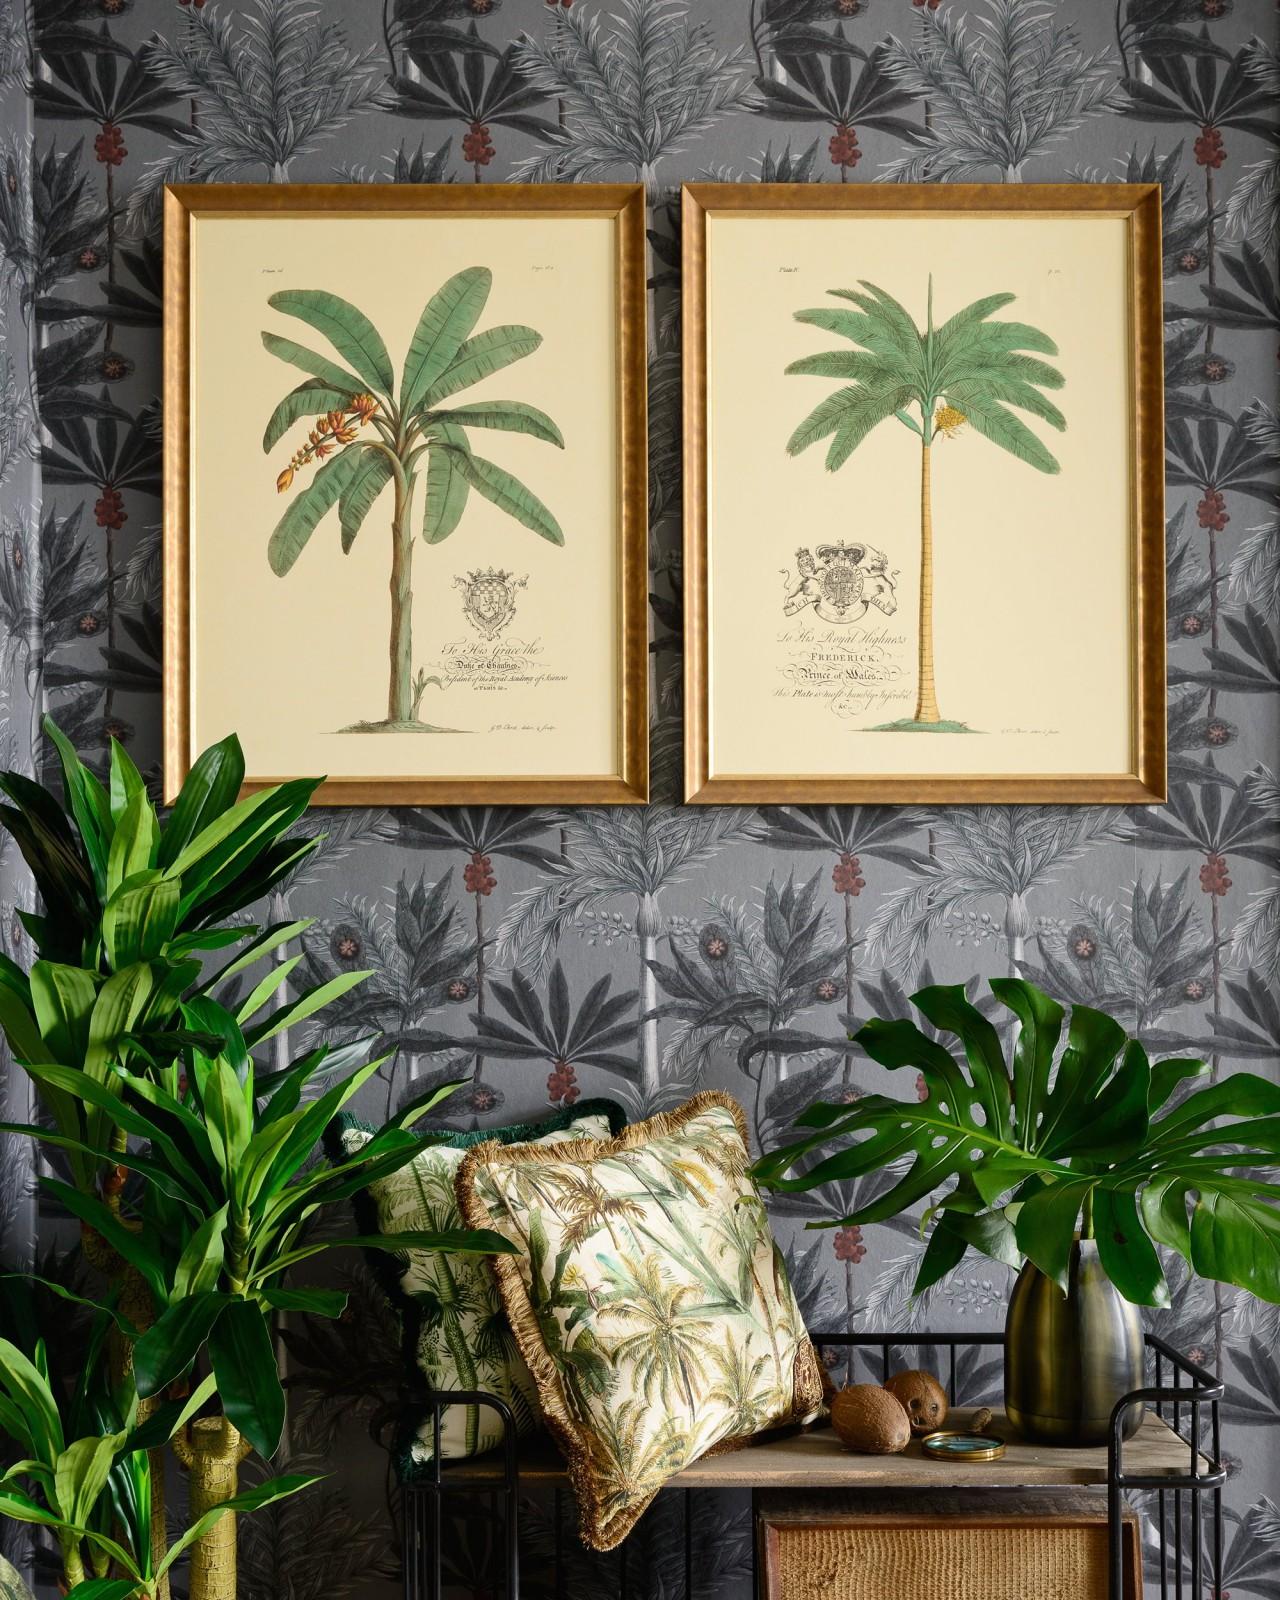 MUSSA AND PALMA - MUSSA PARADISIACA Framed Art